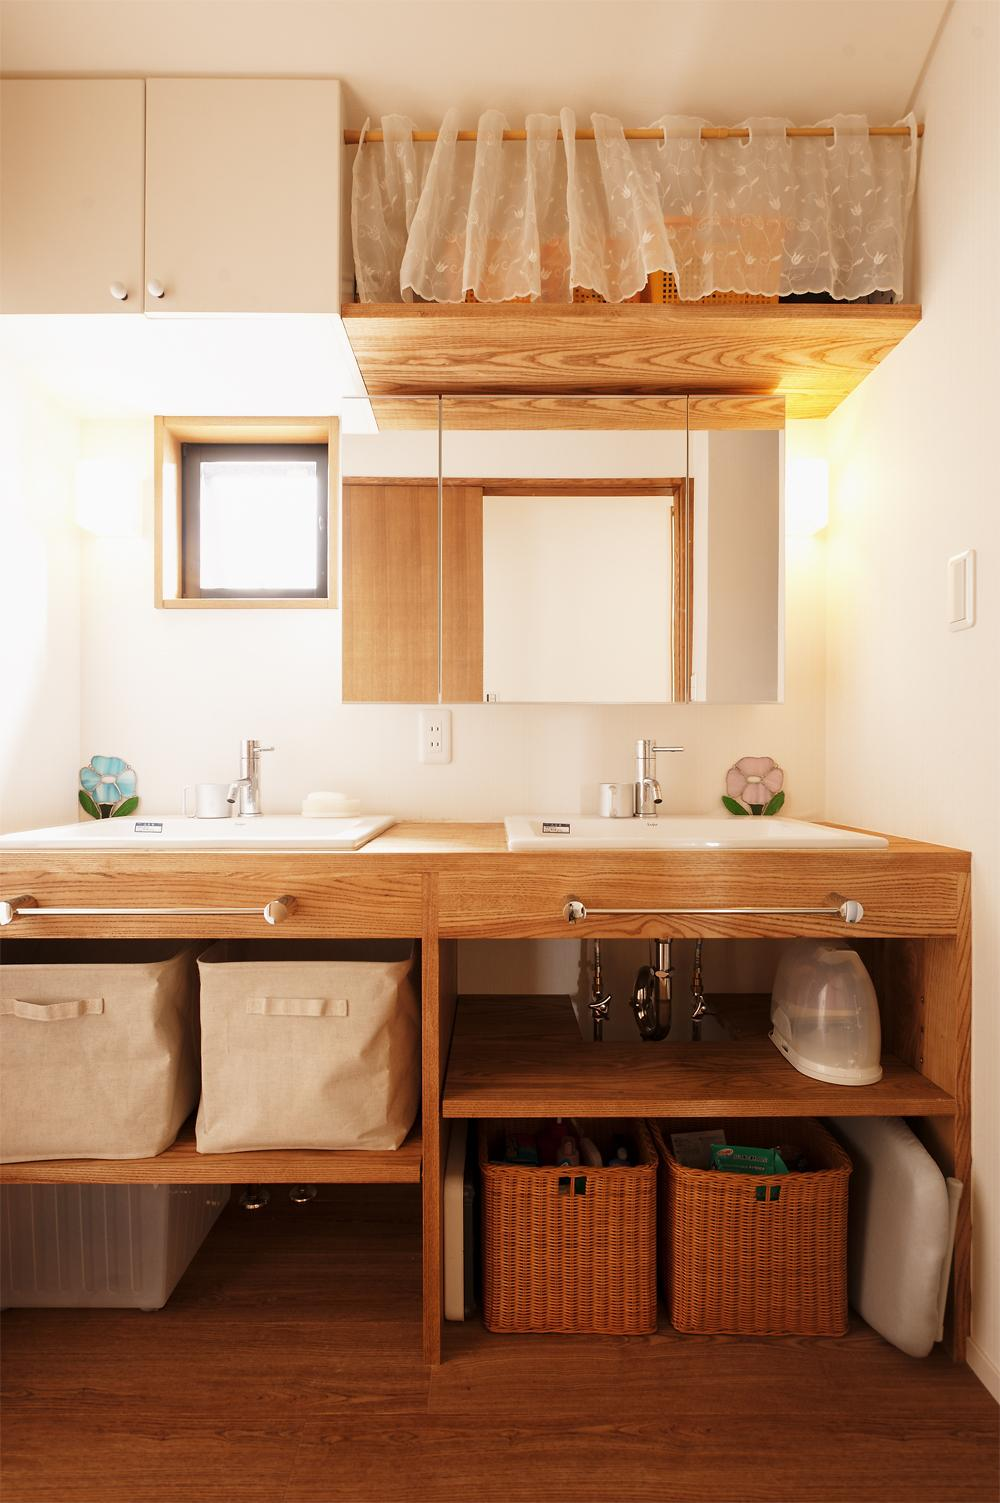 S邸・家族の笑顔がつながるオープンキッチンの部屋 シンクが2つ並ぶ洗面室